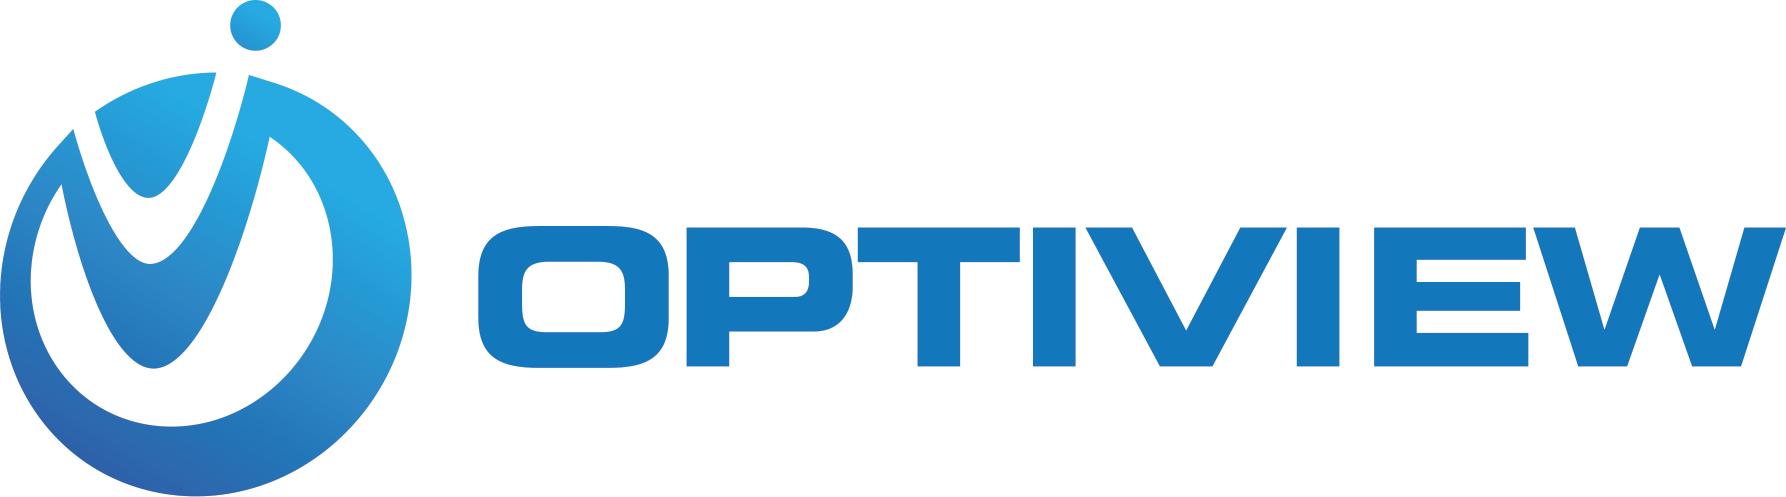 Optiview-Logo-Full-Color